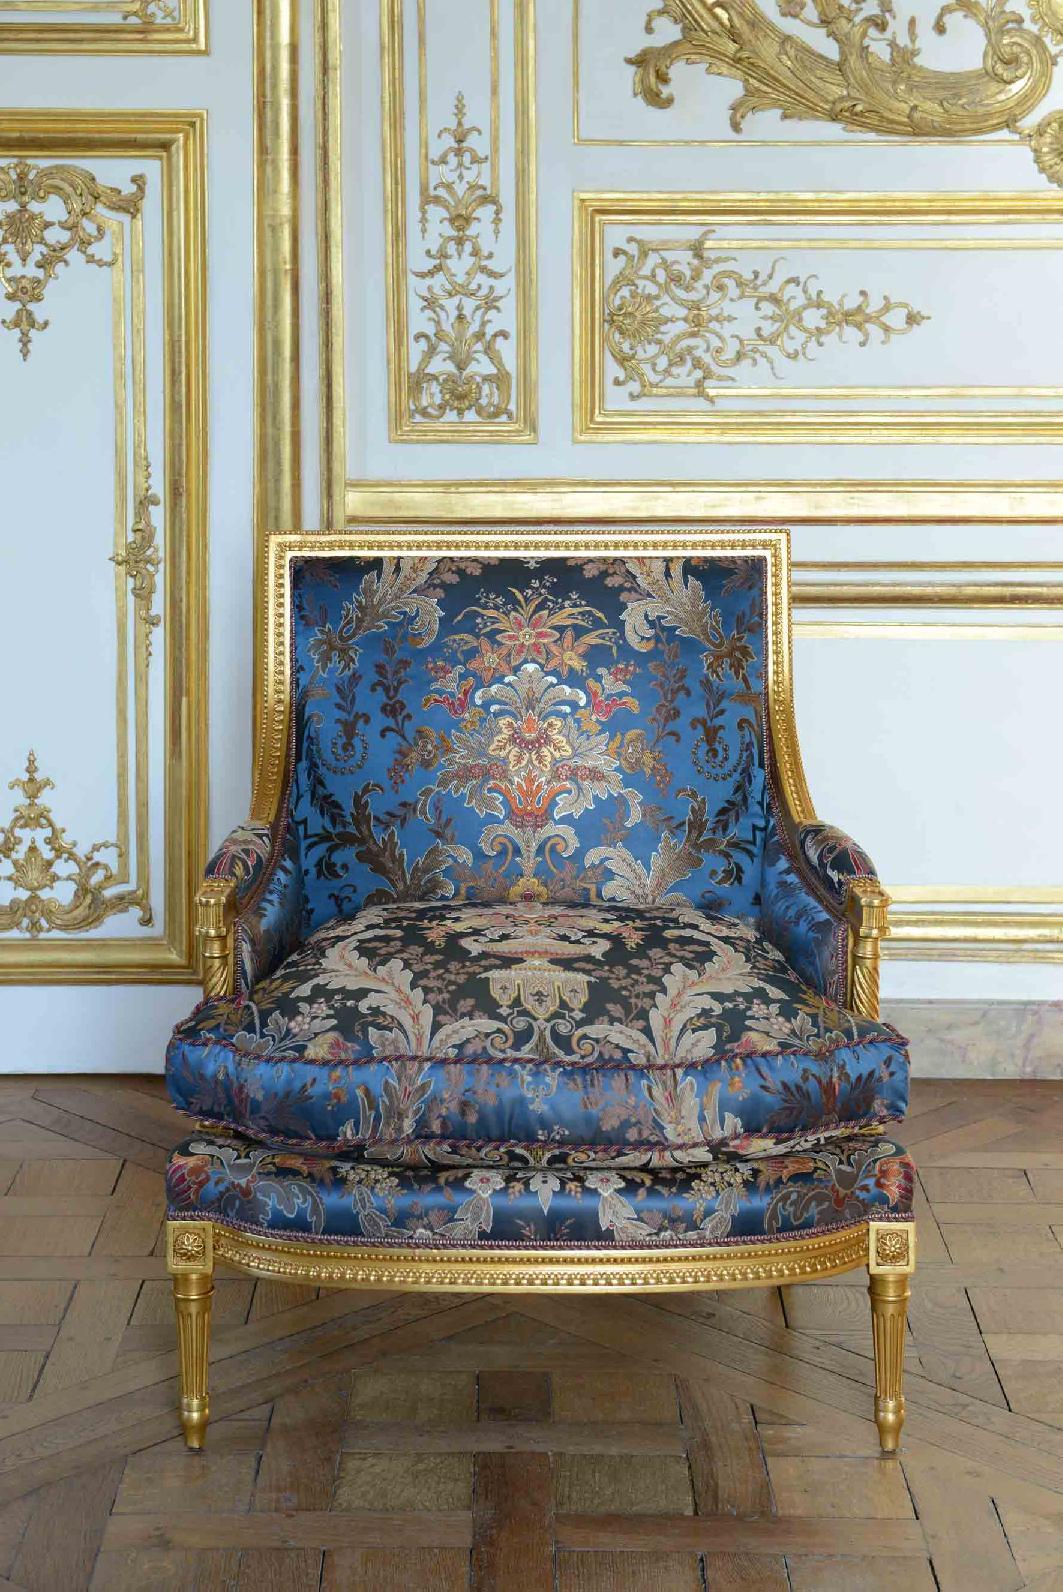 Paris Deco Off 2019 Paris Deco Off 2019 The Best of Upholstery Fabrics: Paris Deco Off 2019 The Best of Upholstery Fabrics Paris Deco Off 2019 2 6